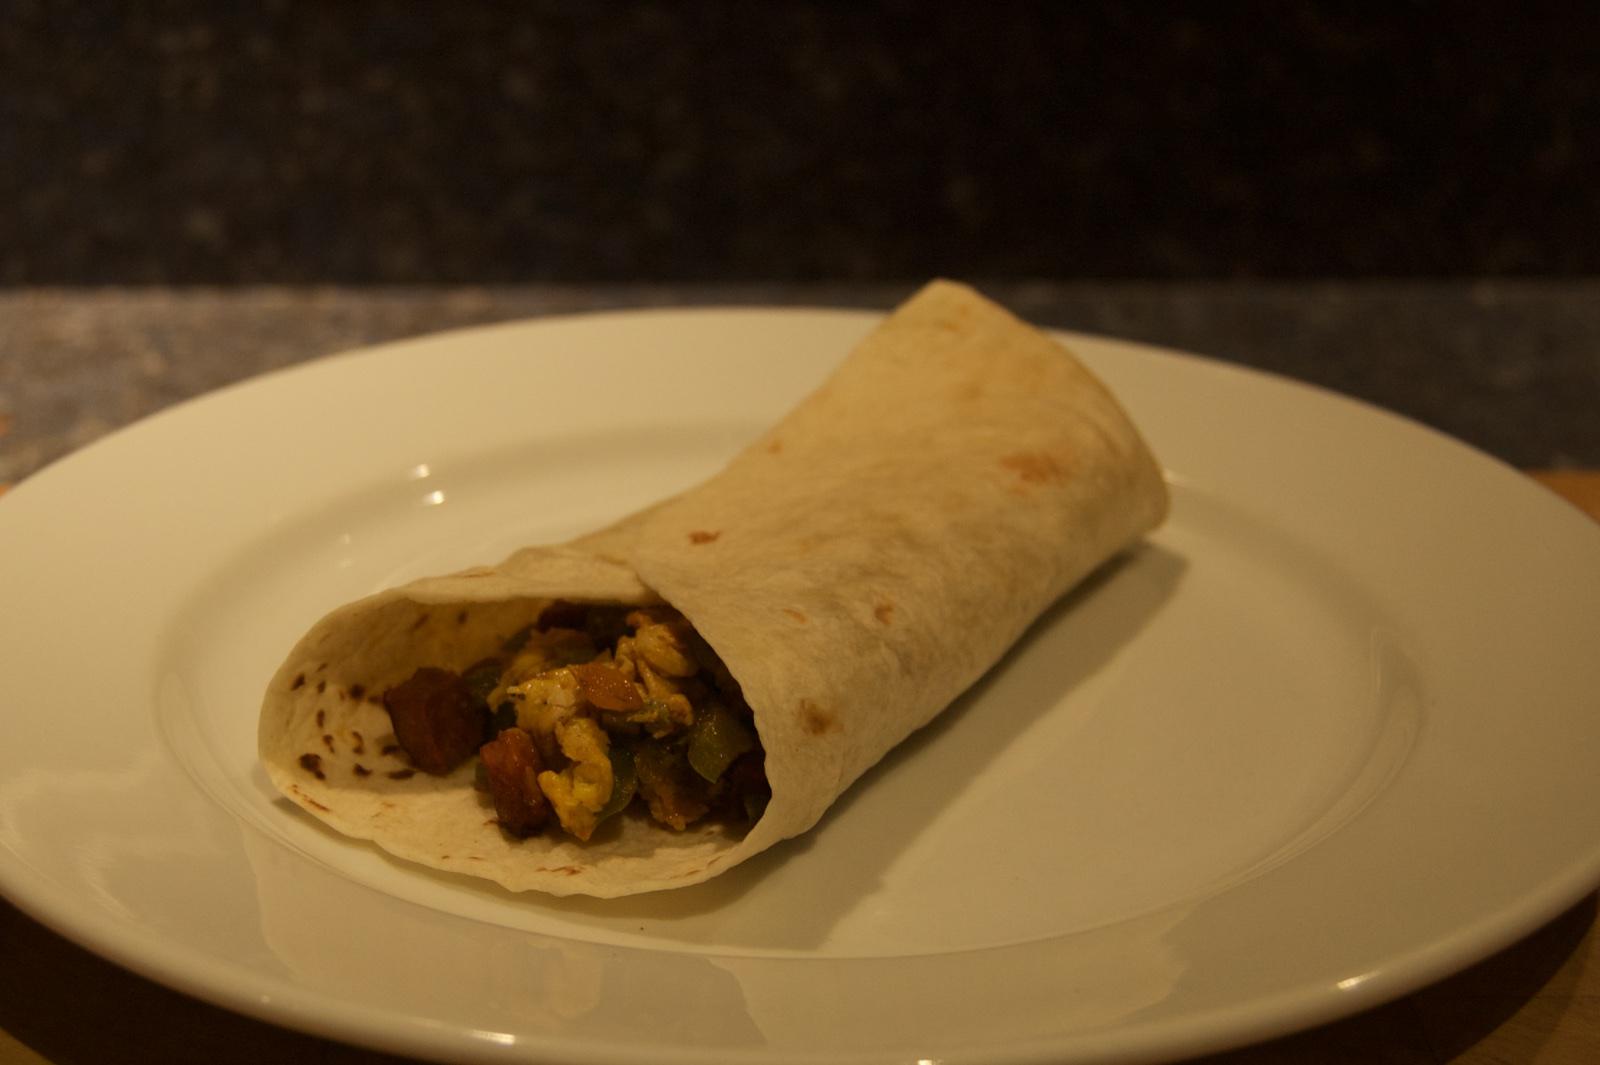 http://blog.rickk.com/food/2015/11/11/ate.2015.11.11.b.jpg